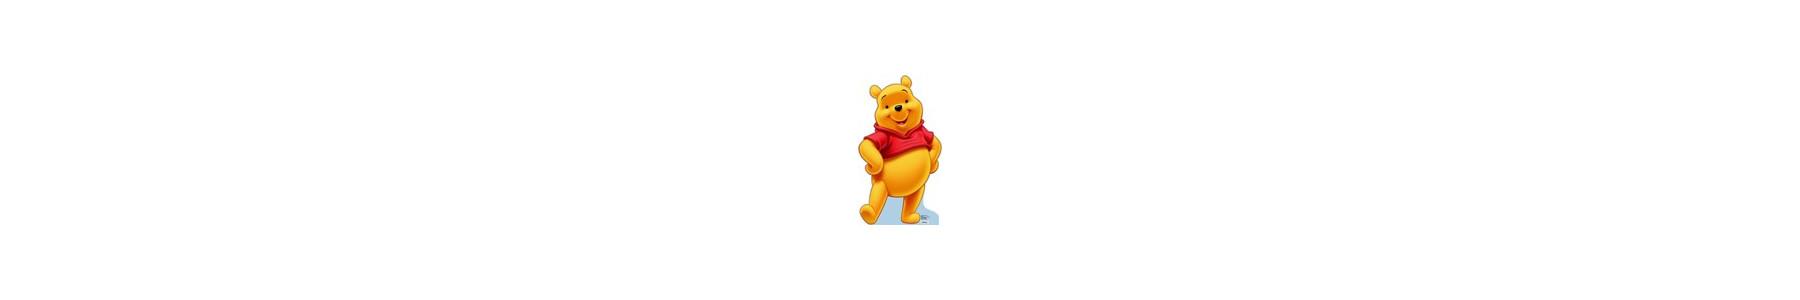 Lumanari Winnie the Pooh